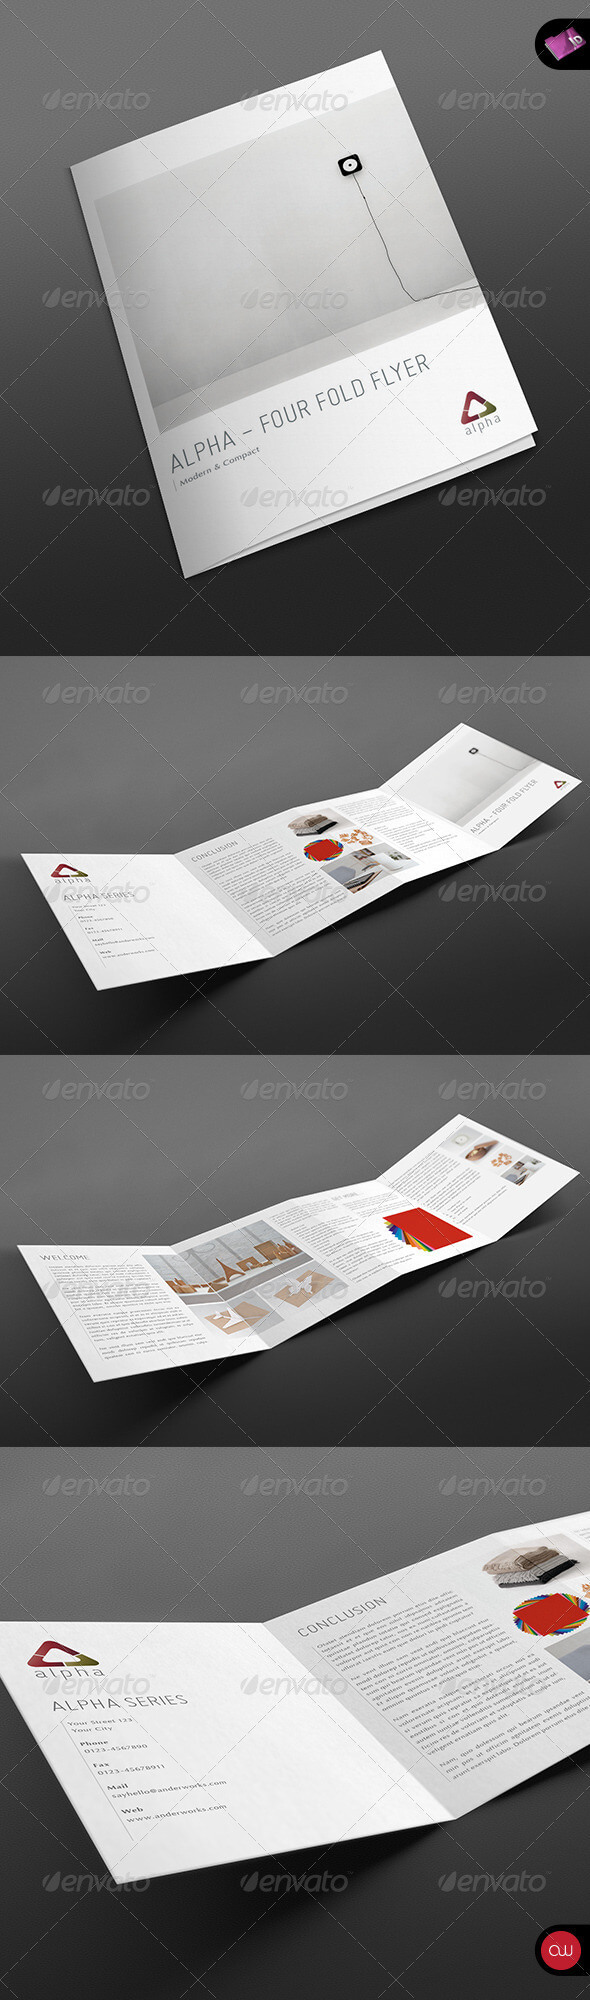 4 Fold Brochure Template – Vol.2 #graphicriver Modern And Within 4 Fold Brochure Template